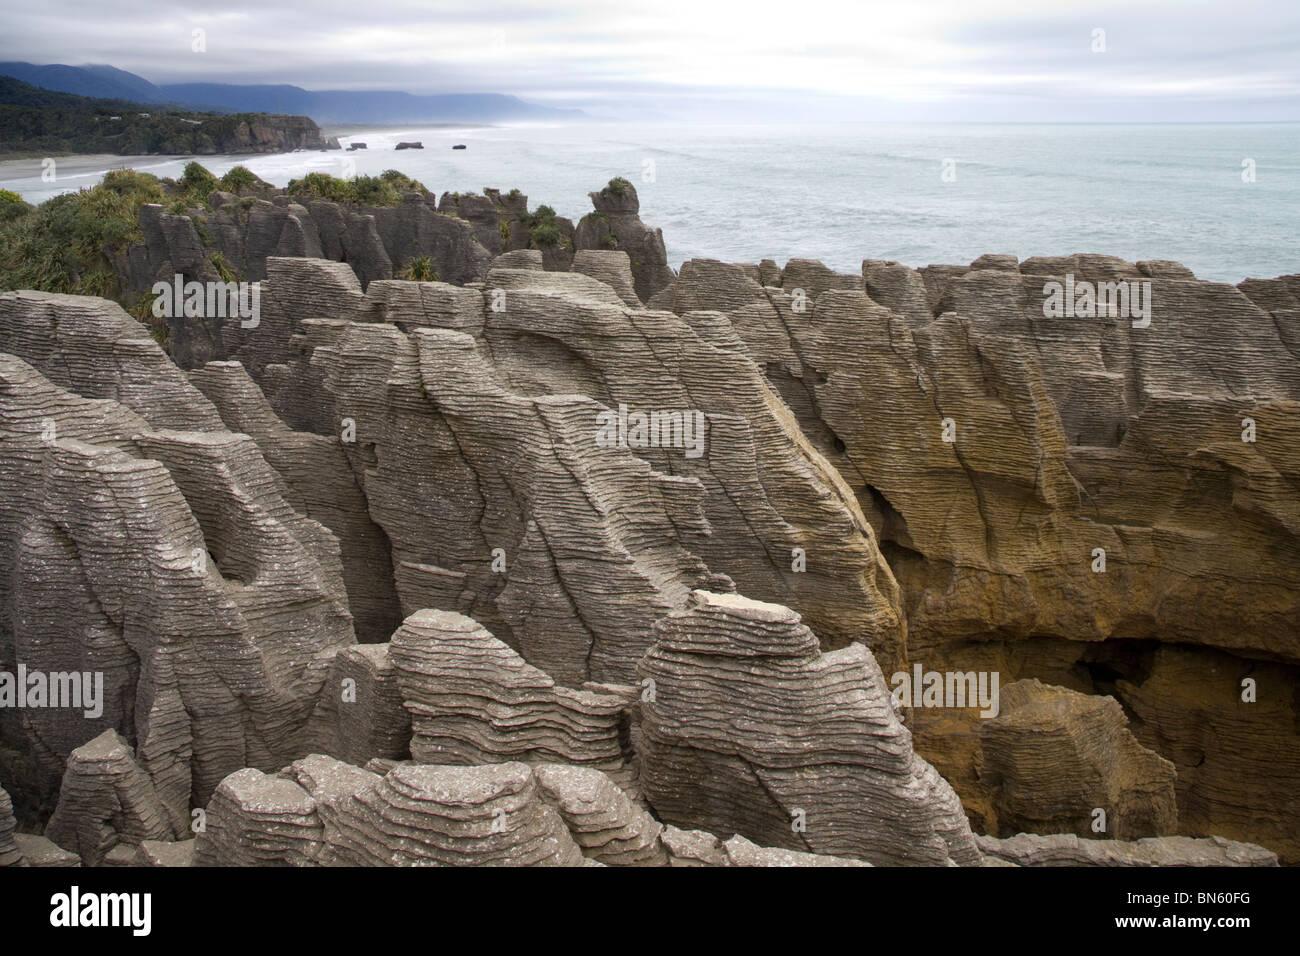 Pancake Rocks at Punakaiki, South Island, New Zealand - Stock Image